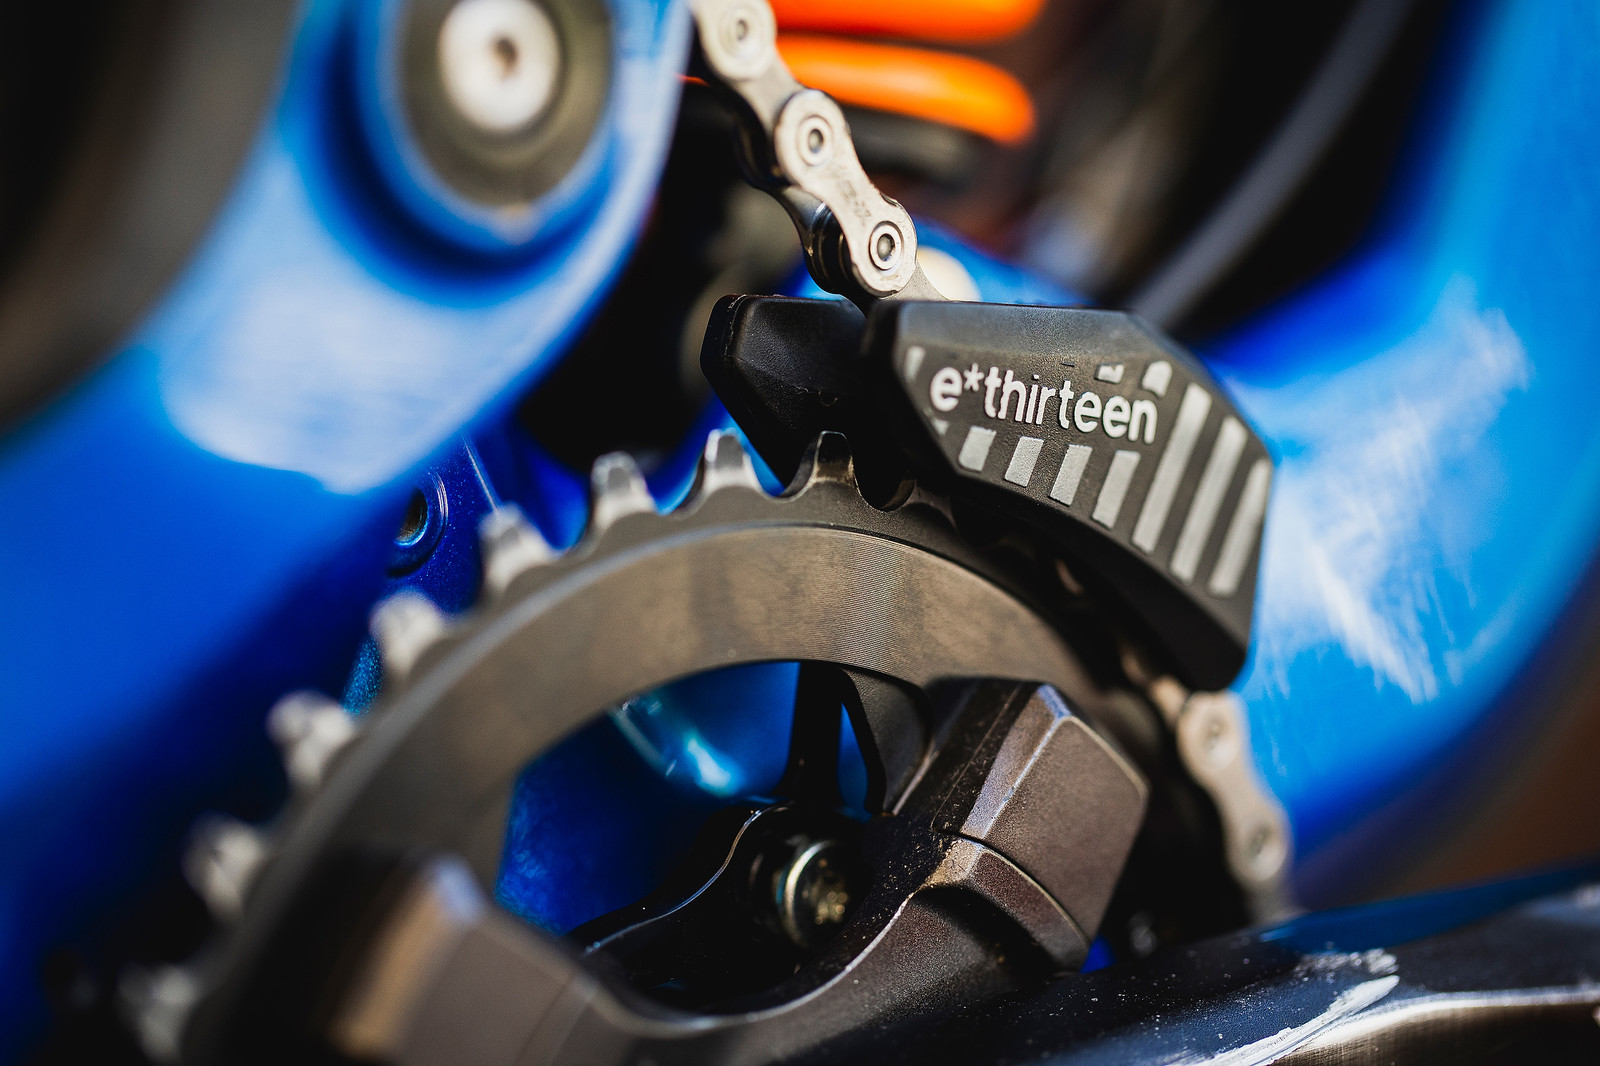 e*thirteen LG1 chainguide with the high pivot - Pro Bike Check - George Brannigan's GT Fury - Mountain Biking Pictures - Vital MTB